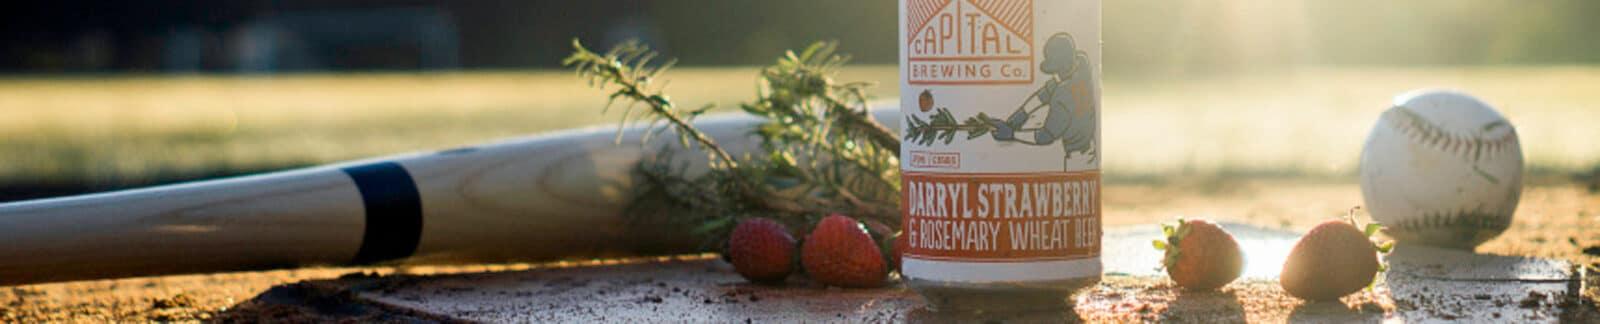 Darryl Strawberry & Rosemary Wheat Beer header